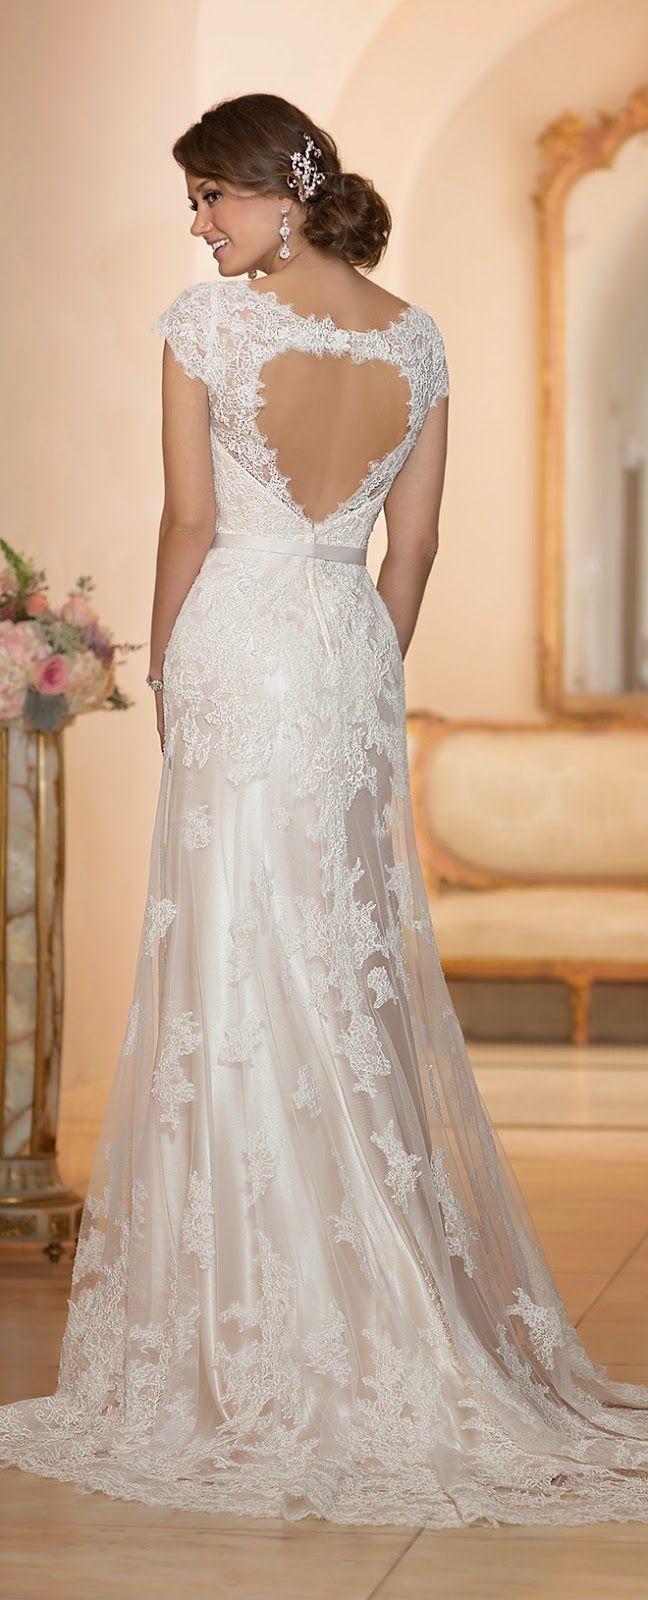 Свадьба - Wedding Dresses - Cobbprom.com